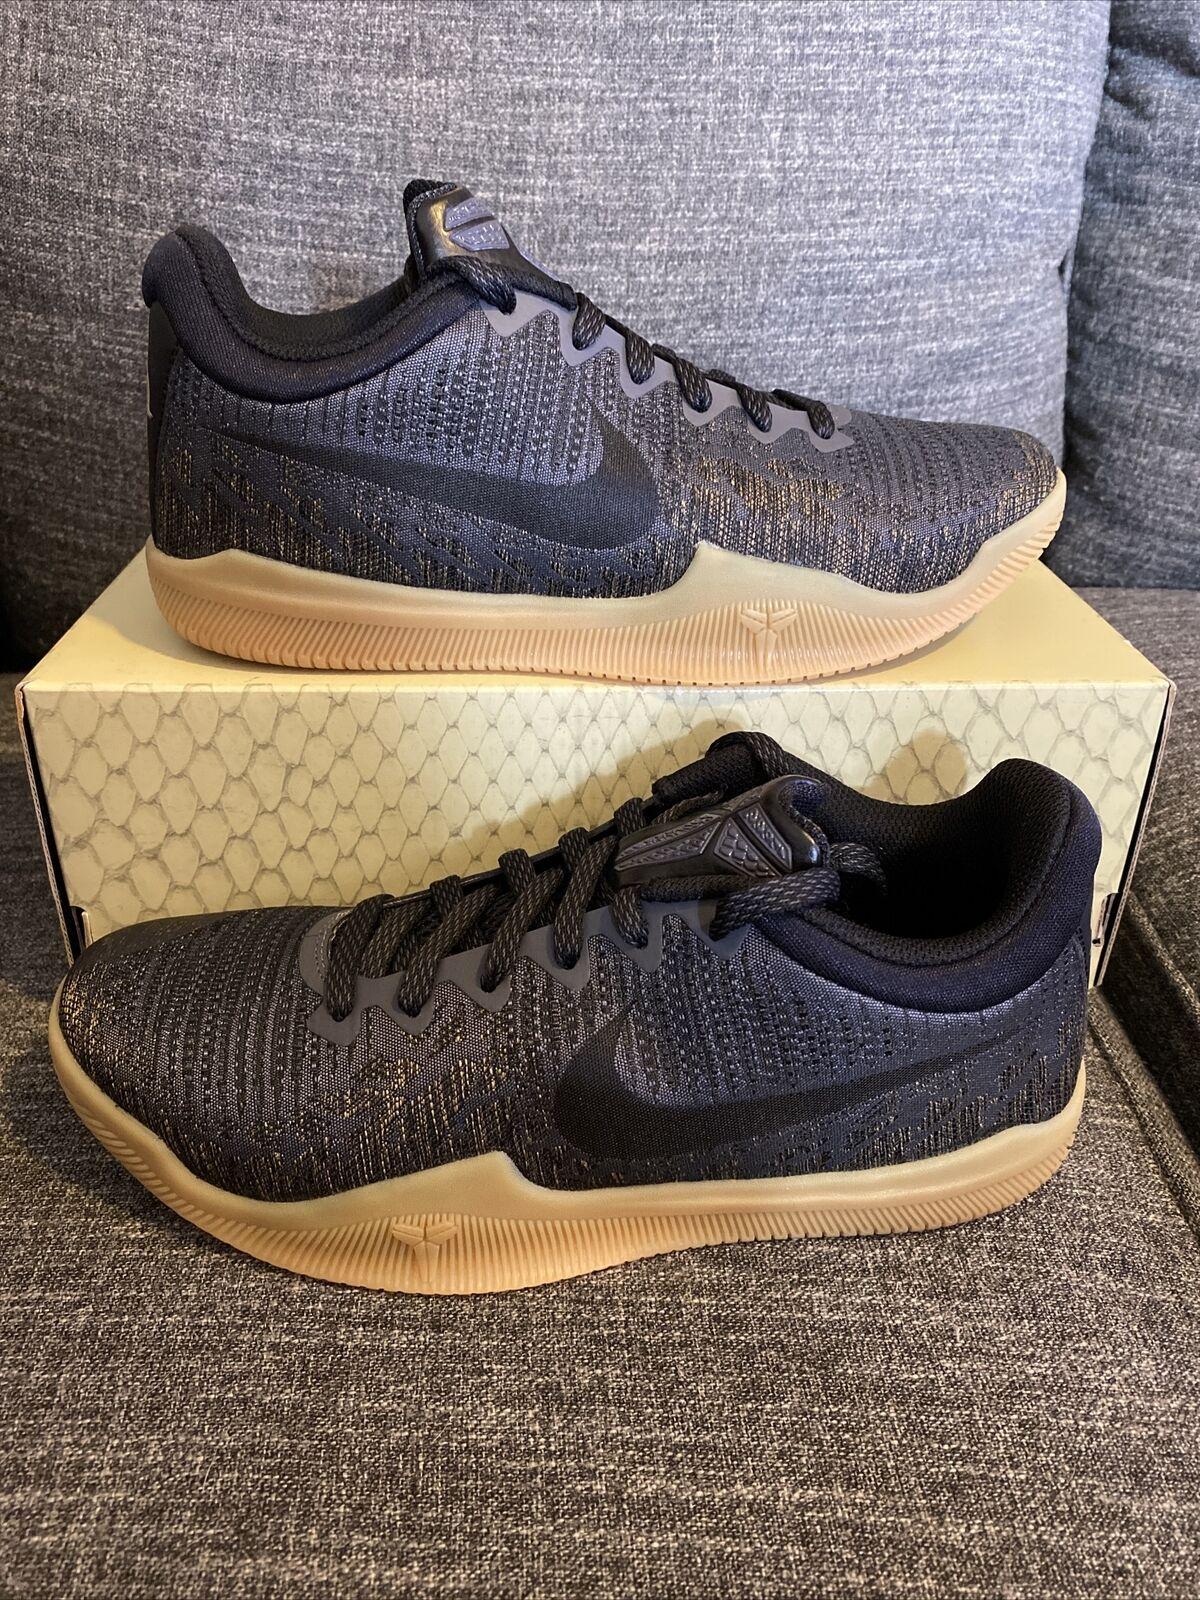 Size 7.5 - Nike Mamba Rage Premium Komodo for sale online | eBay